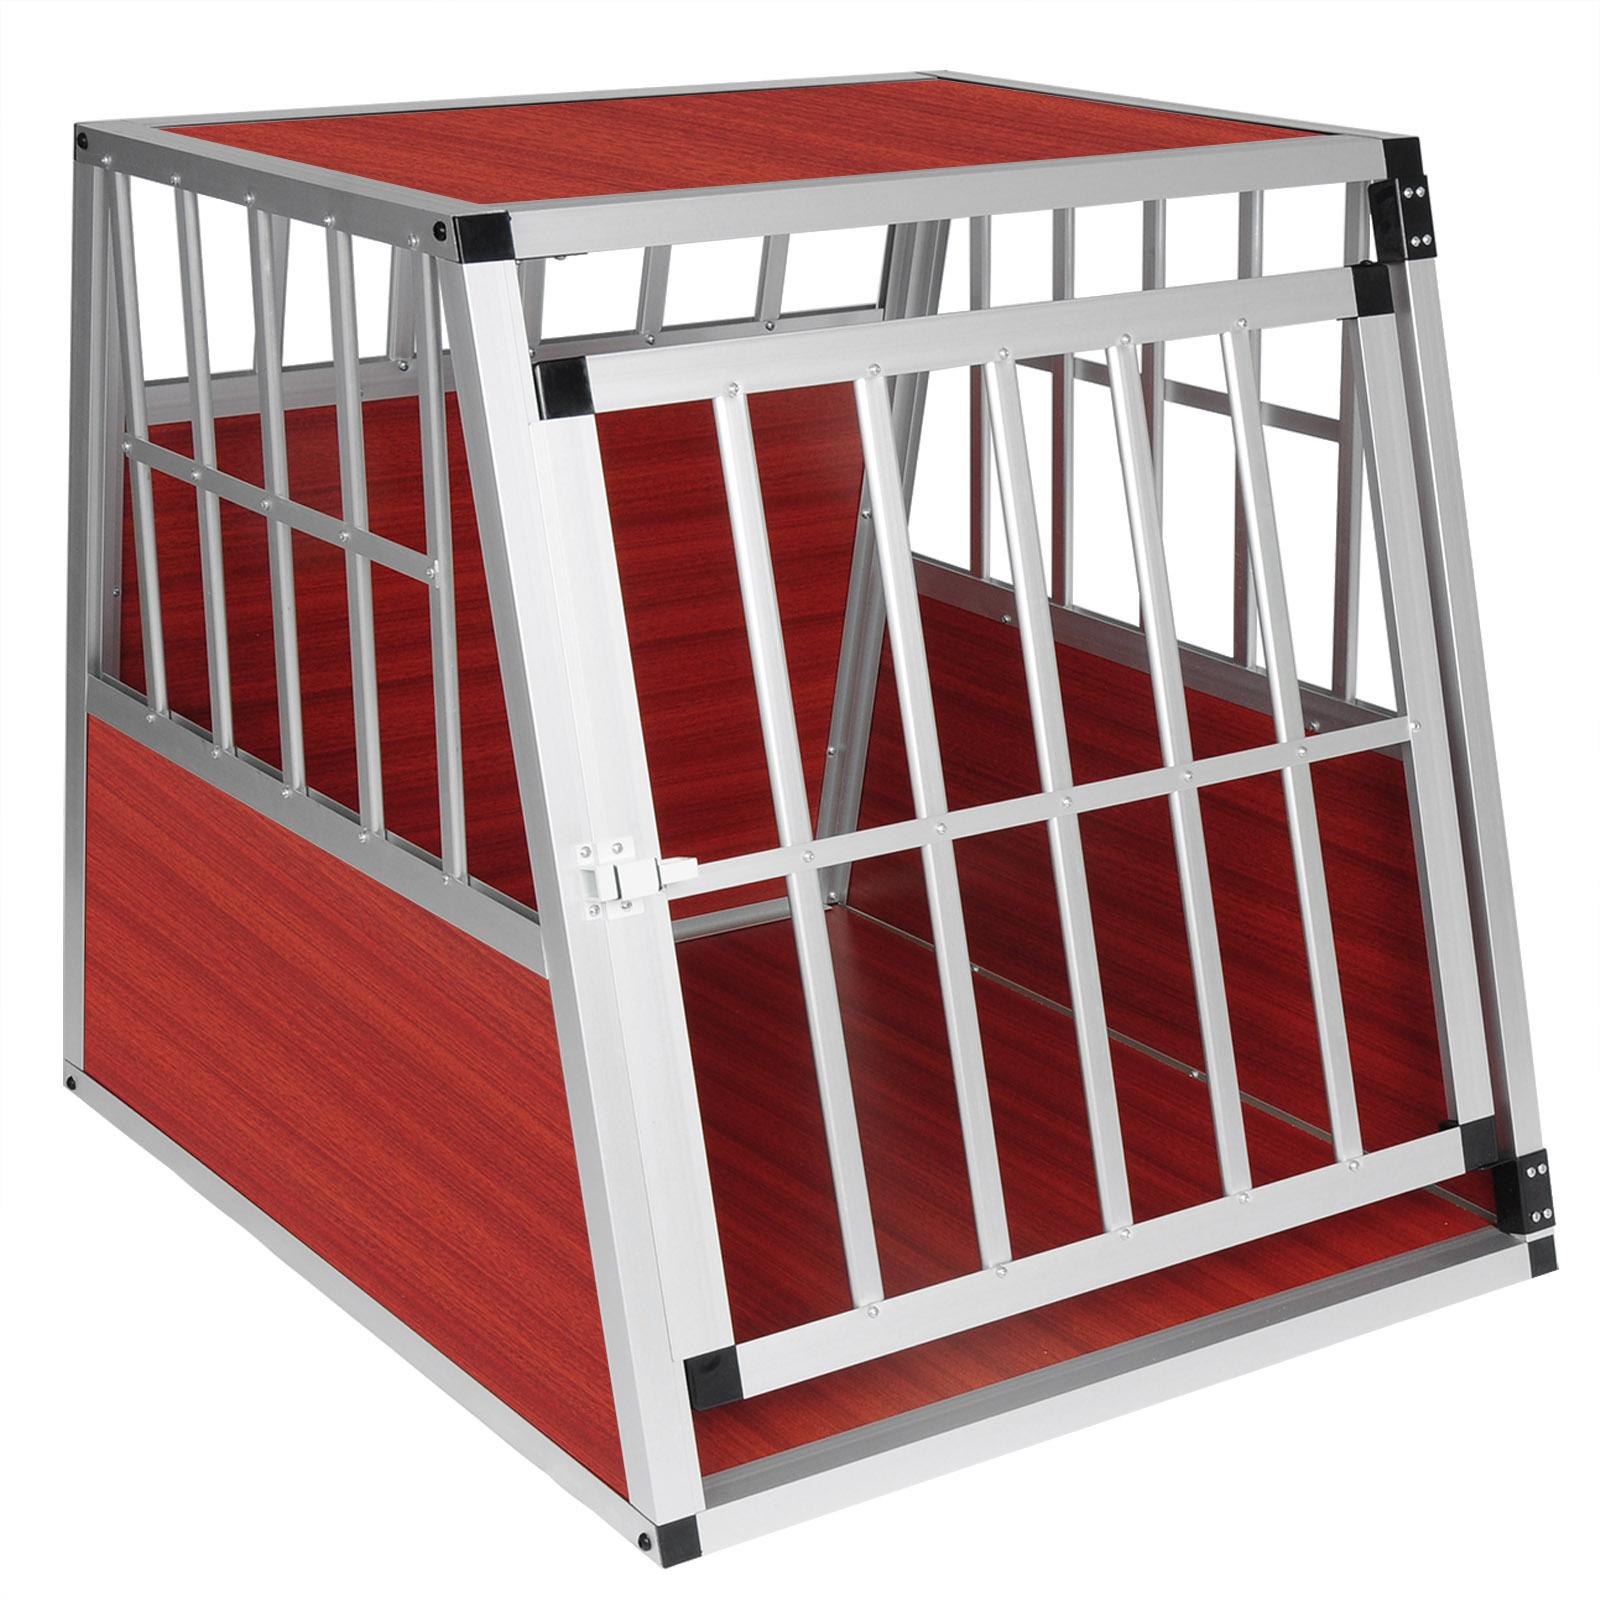 hundebox alu reisebox alubox transportbox autotransportbox. Black Bedroom Furniture Sets. Home Design Ideas